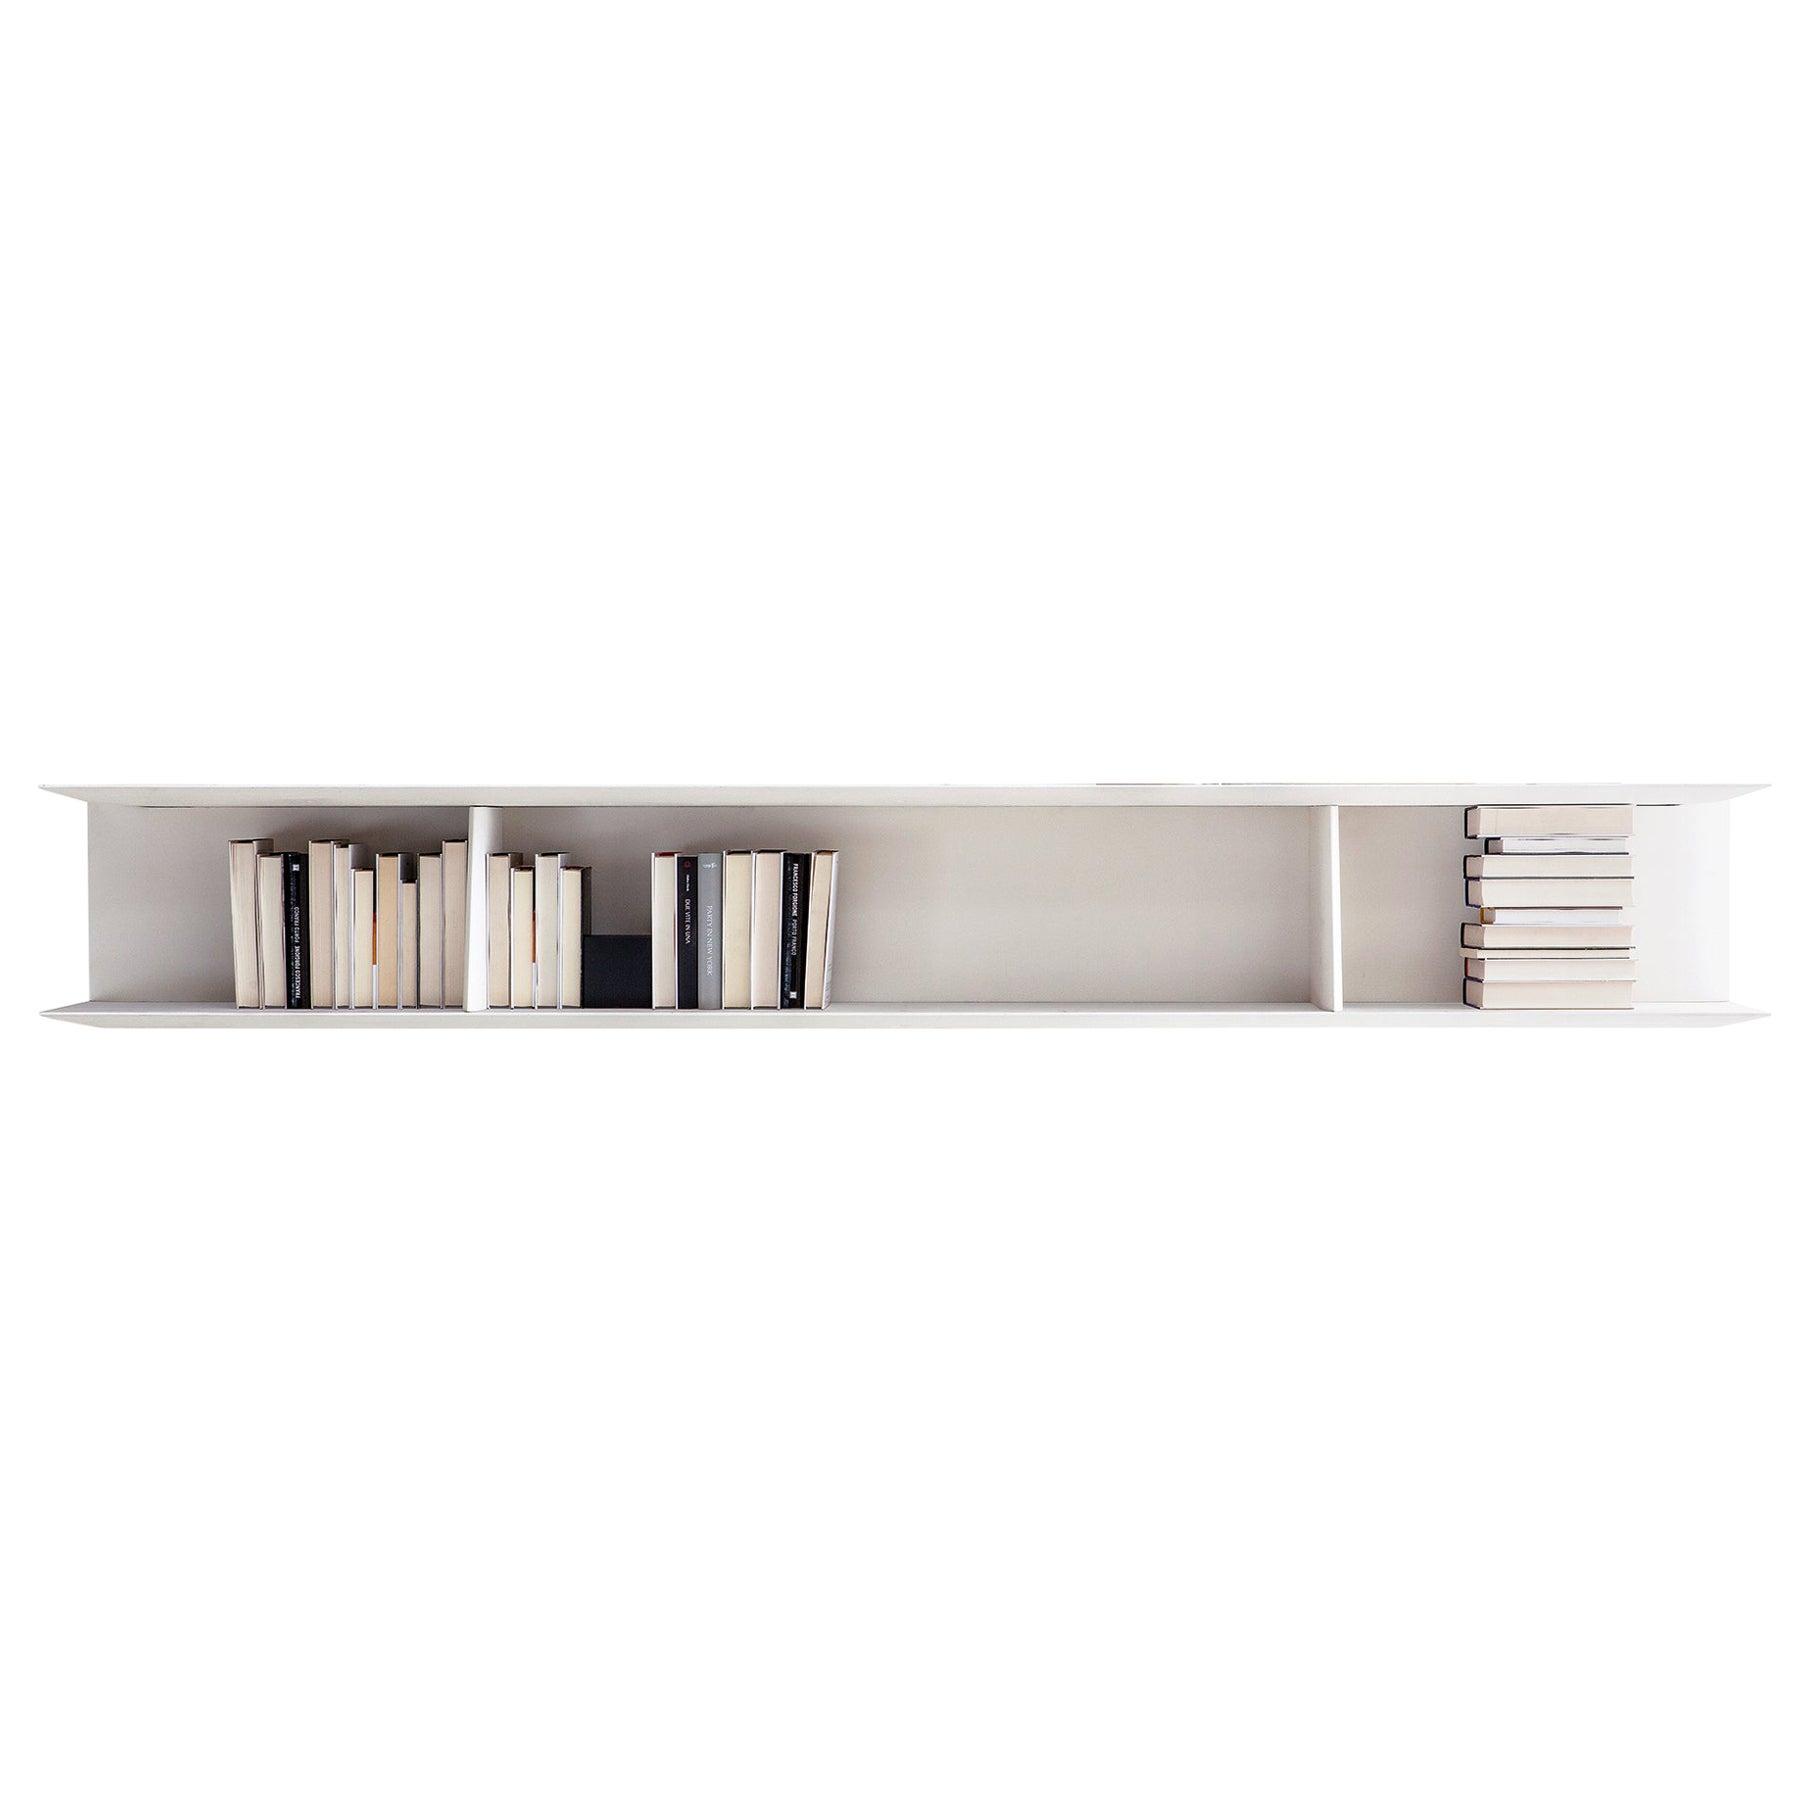 Molteni&C D.355.1 Large Suspended Bookcase Shelf in White by Gio Ponti